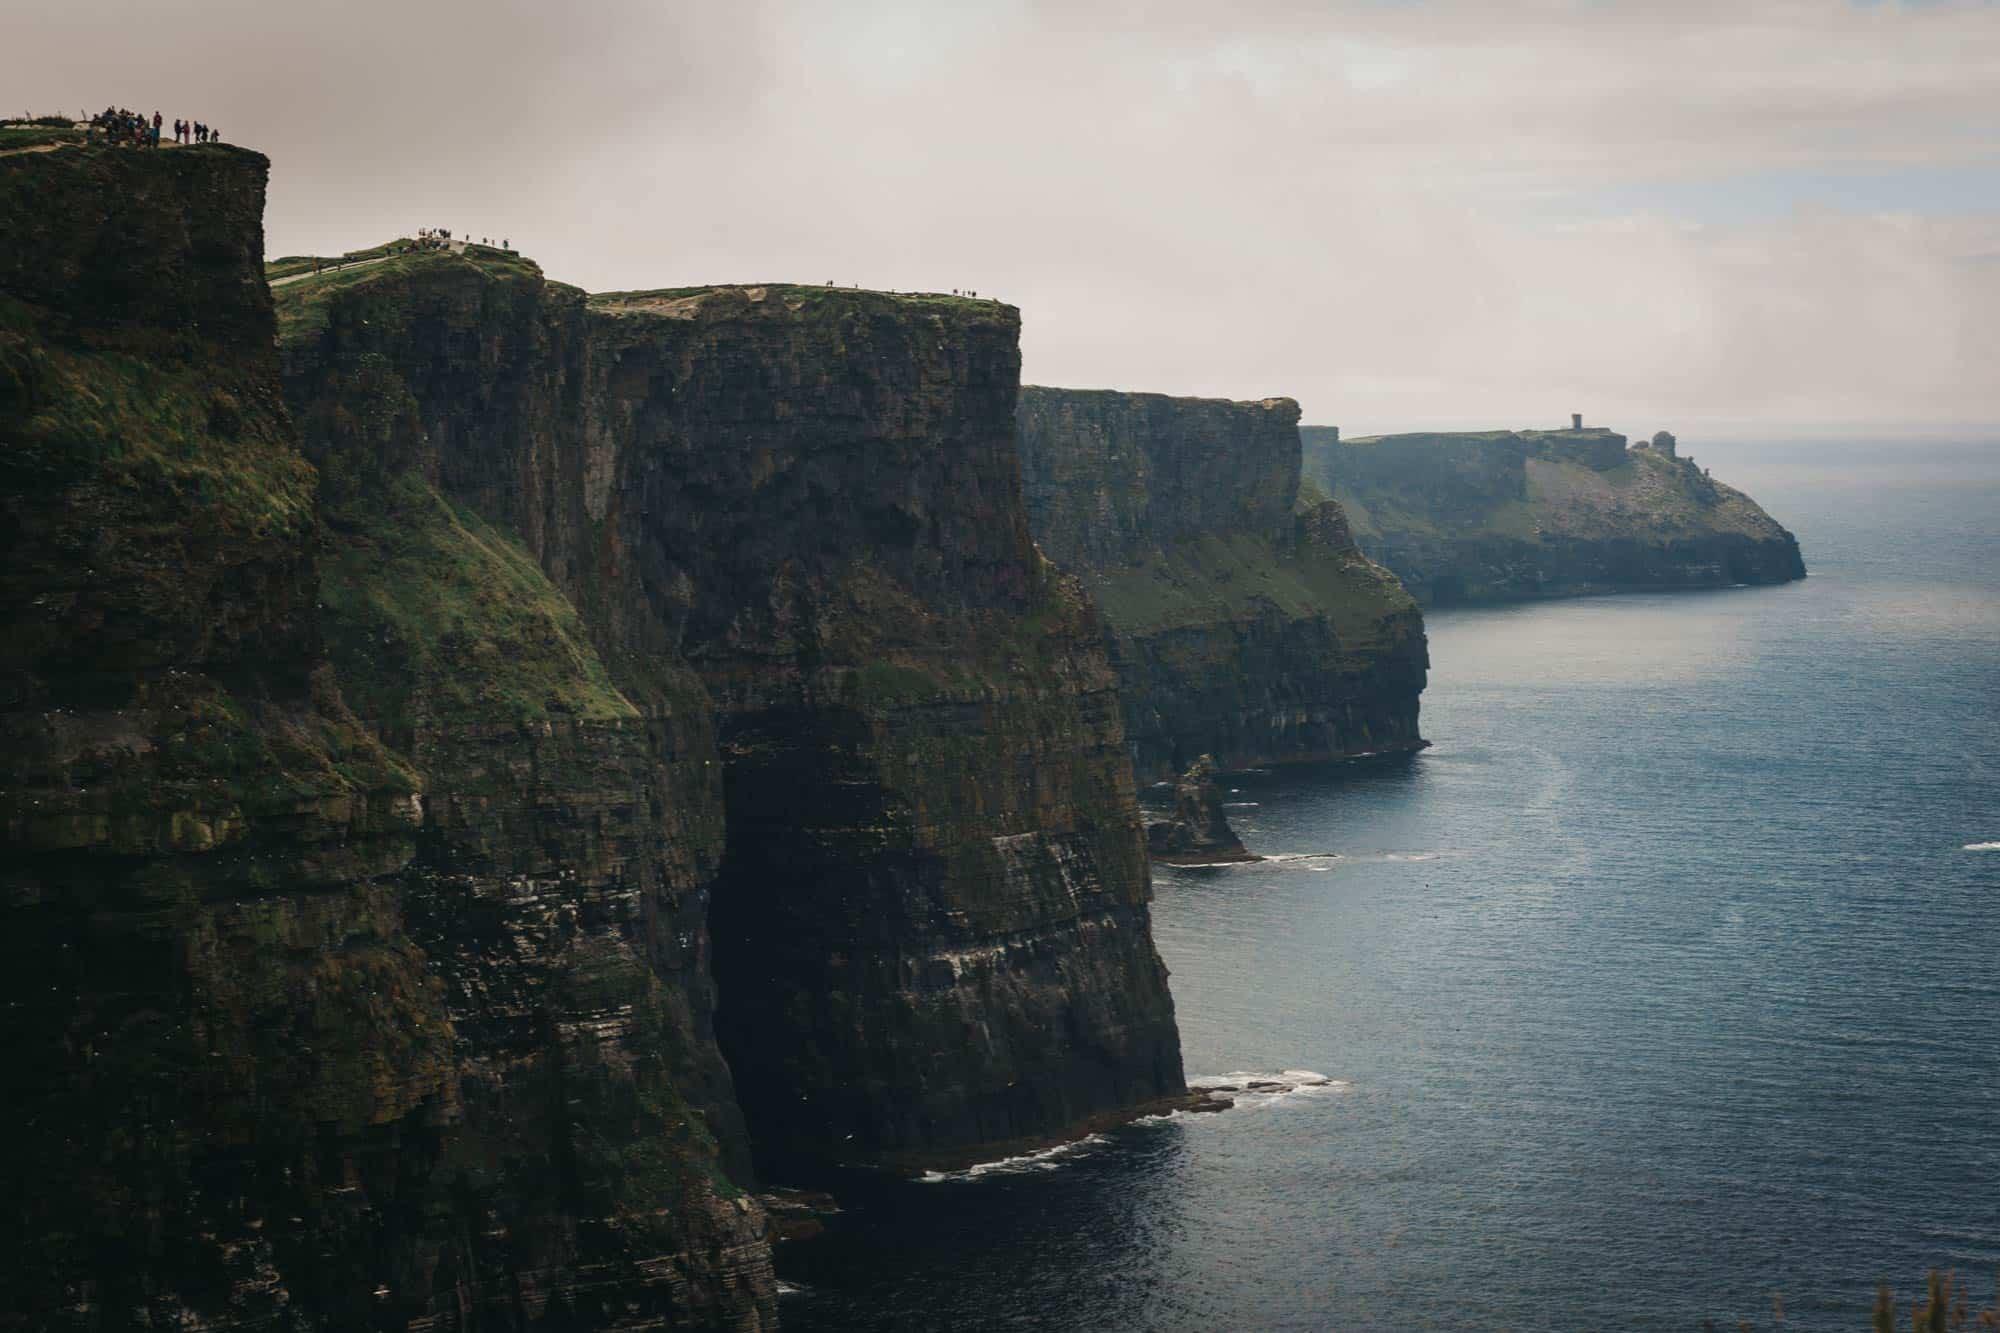 Proposal shoot Ireland Cliffs from lower